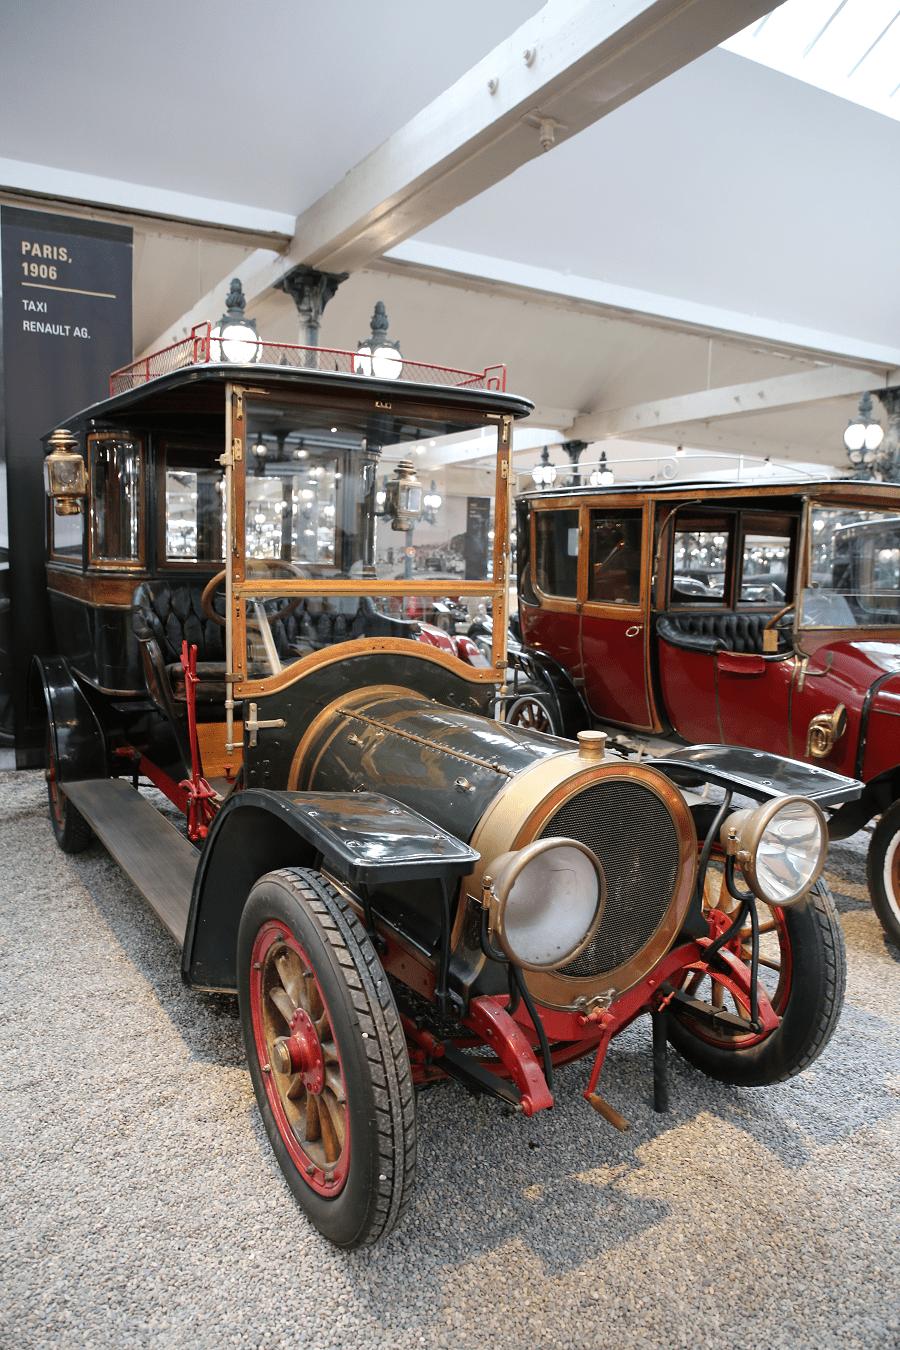 Delaunay-Belleville bus Hotel Type F6 : voiture ancienne